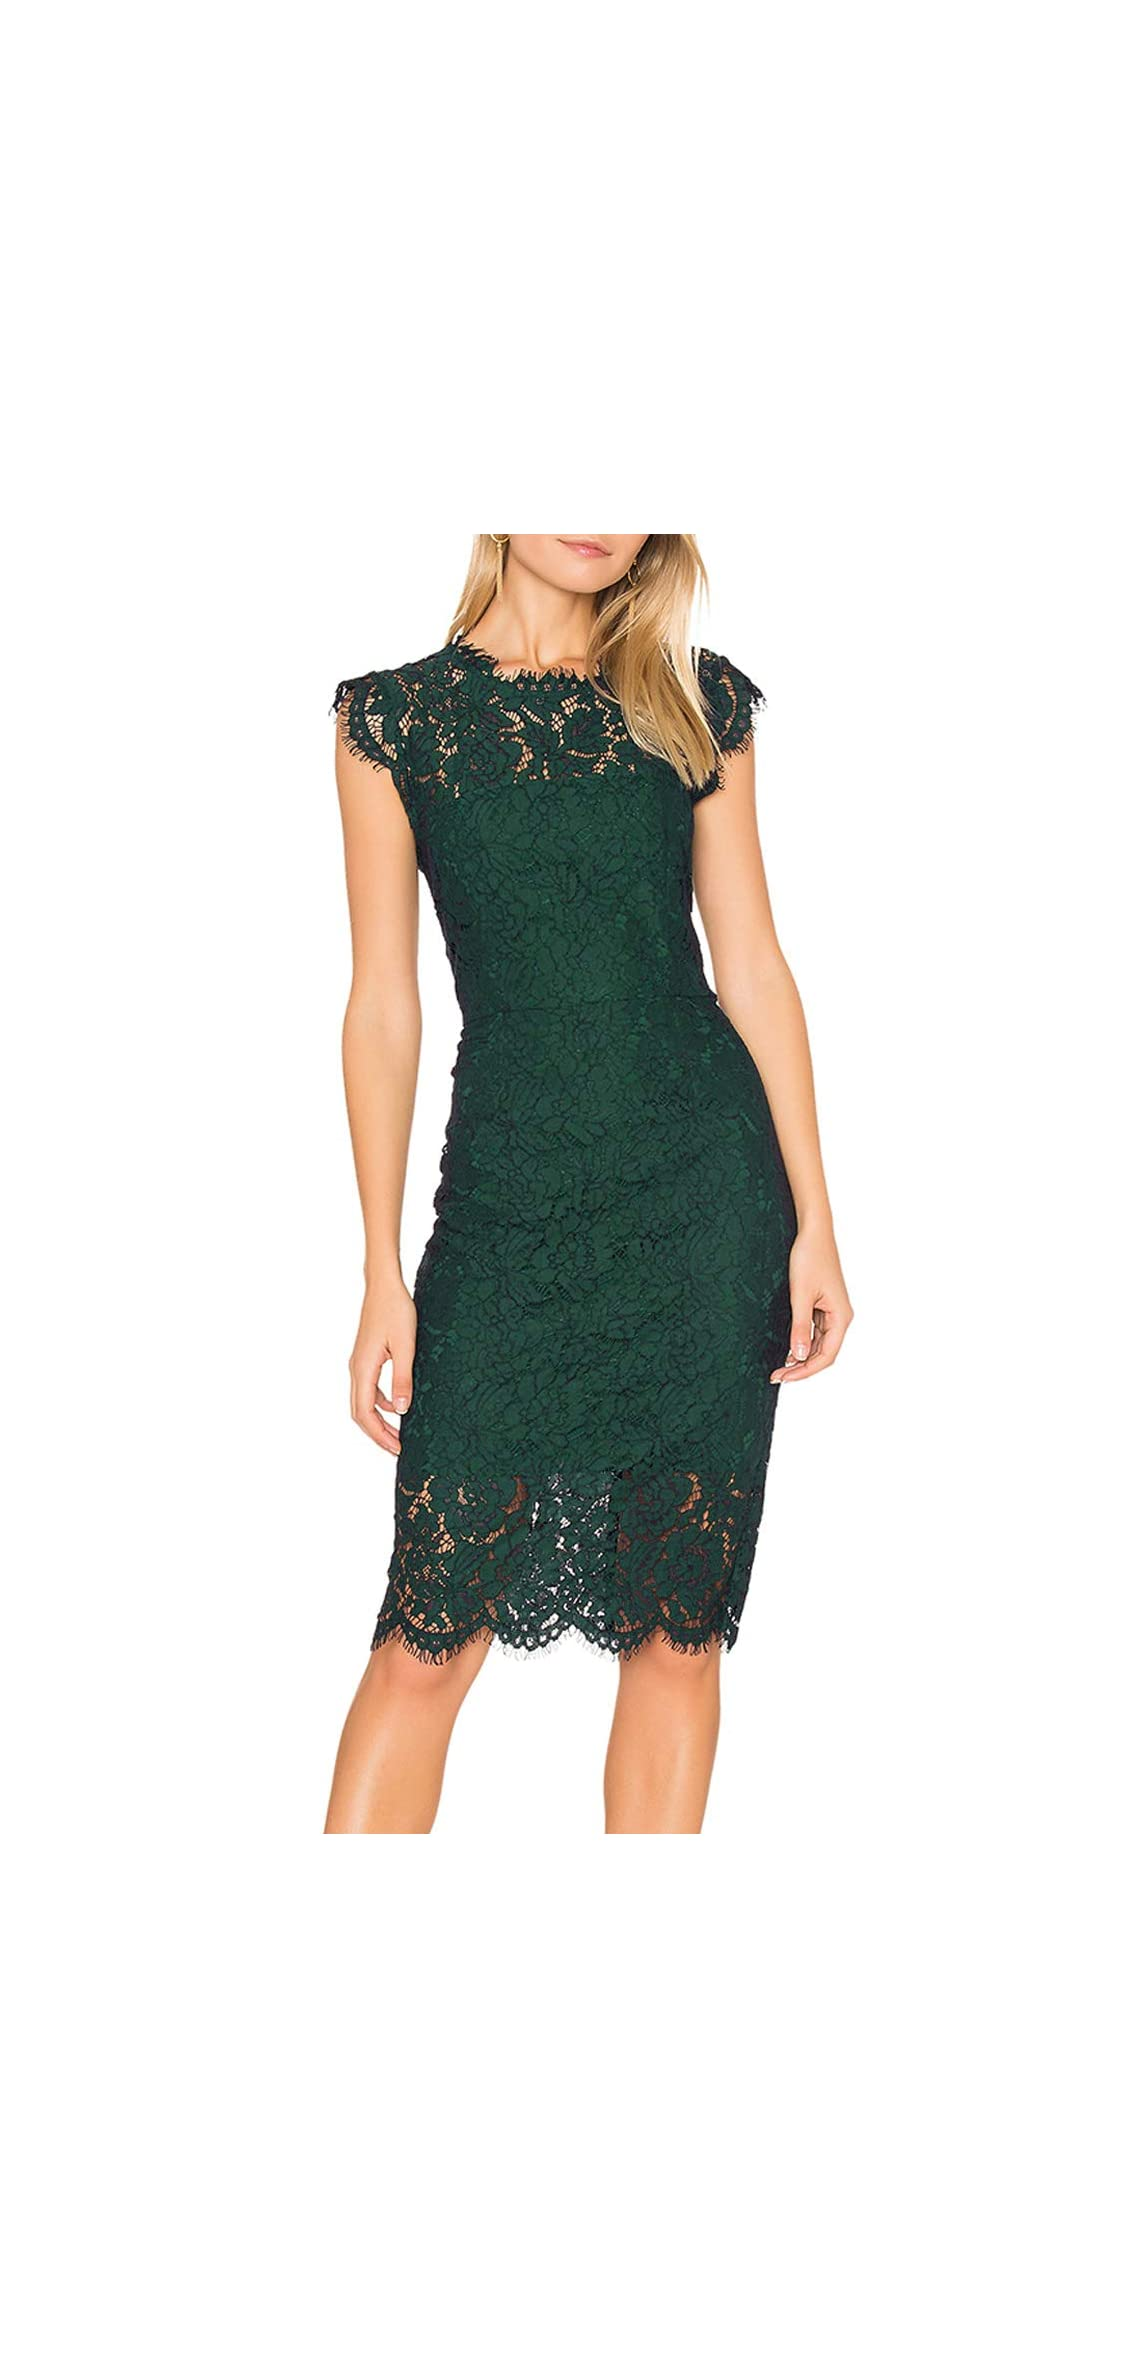 Women's Sleeveless Lace Floral Elegant Cocktail Dress